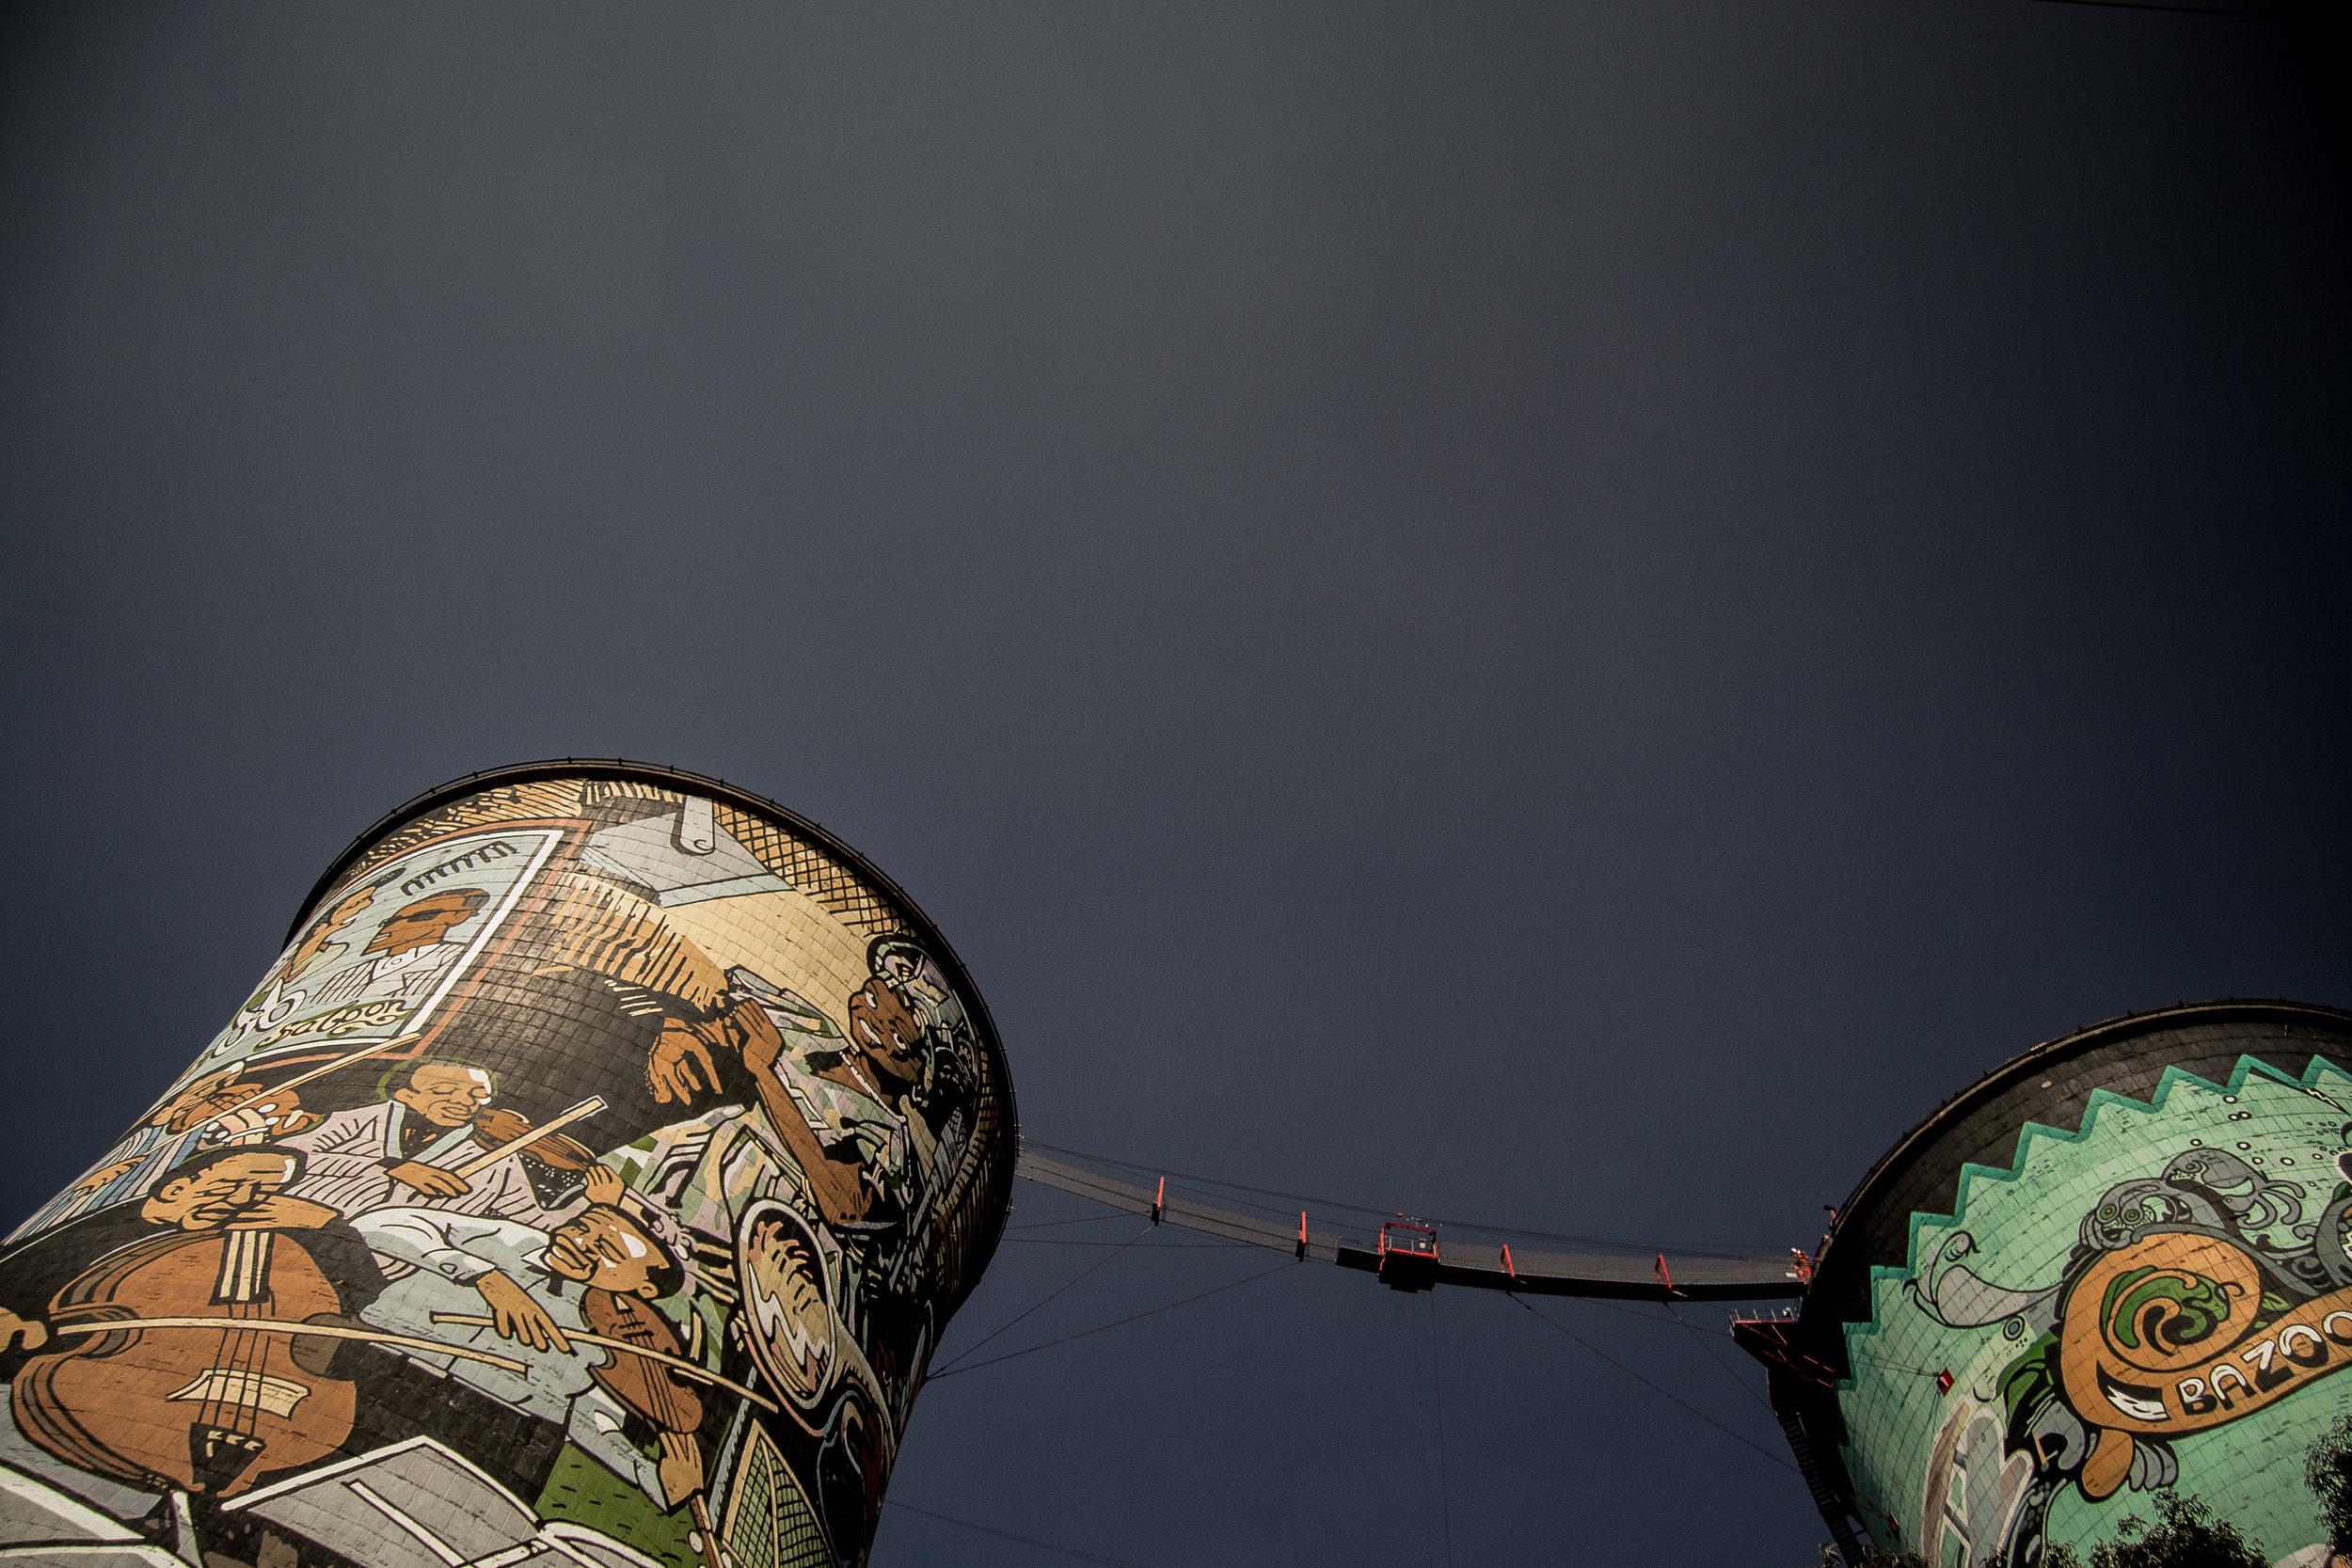 Joburg Night Life - Soweto Towers